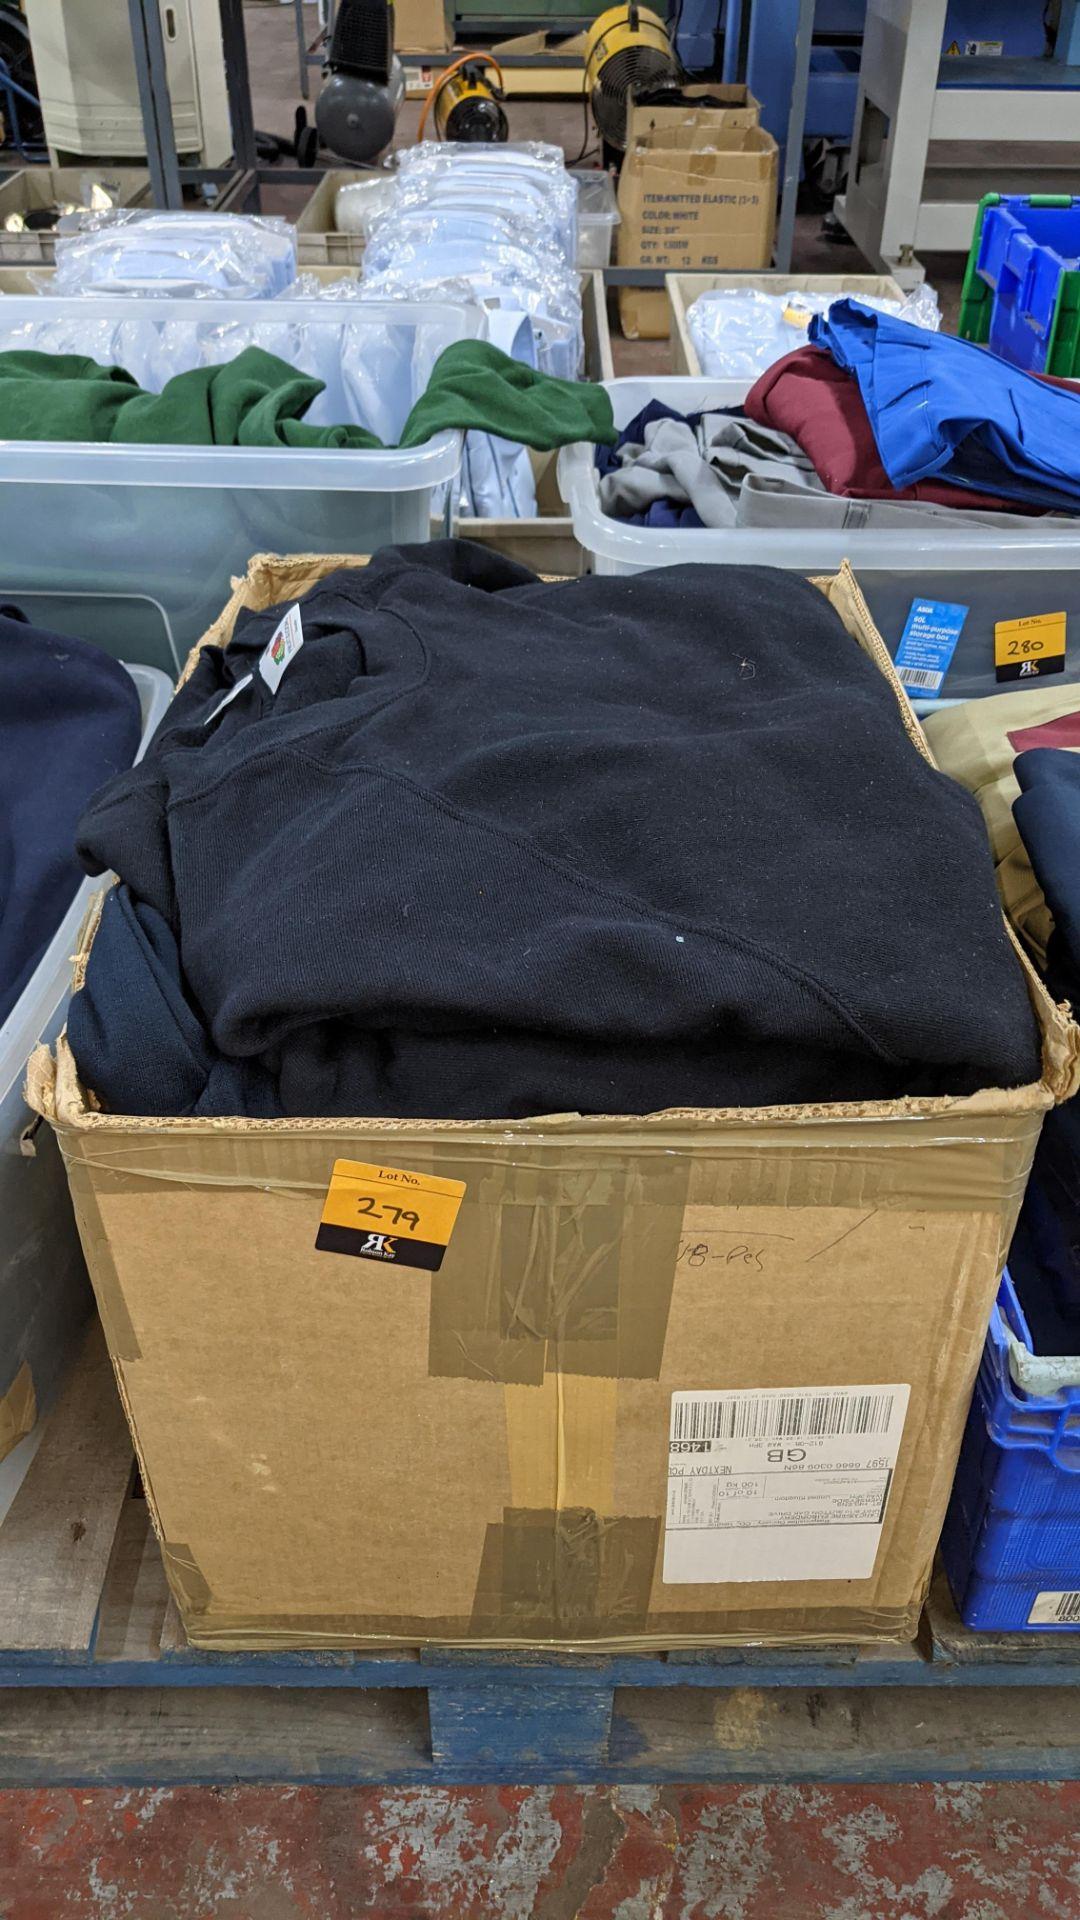 Quantity of black sweatshirts - 1 large box - Image 2 of 4